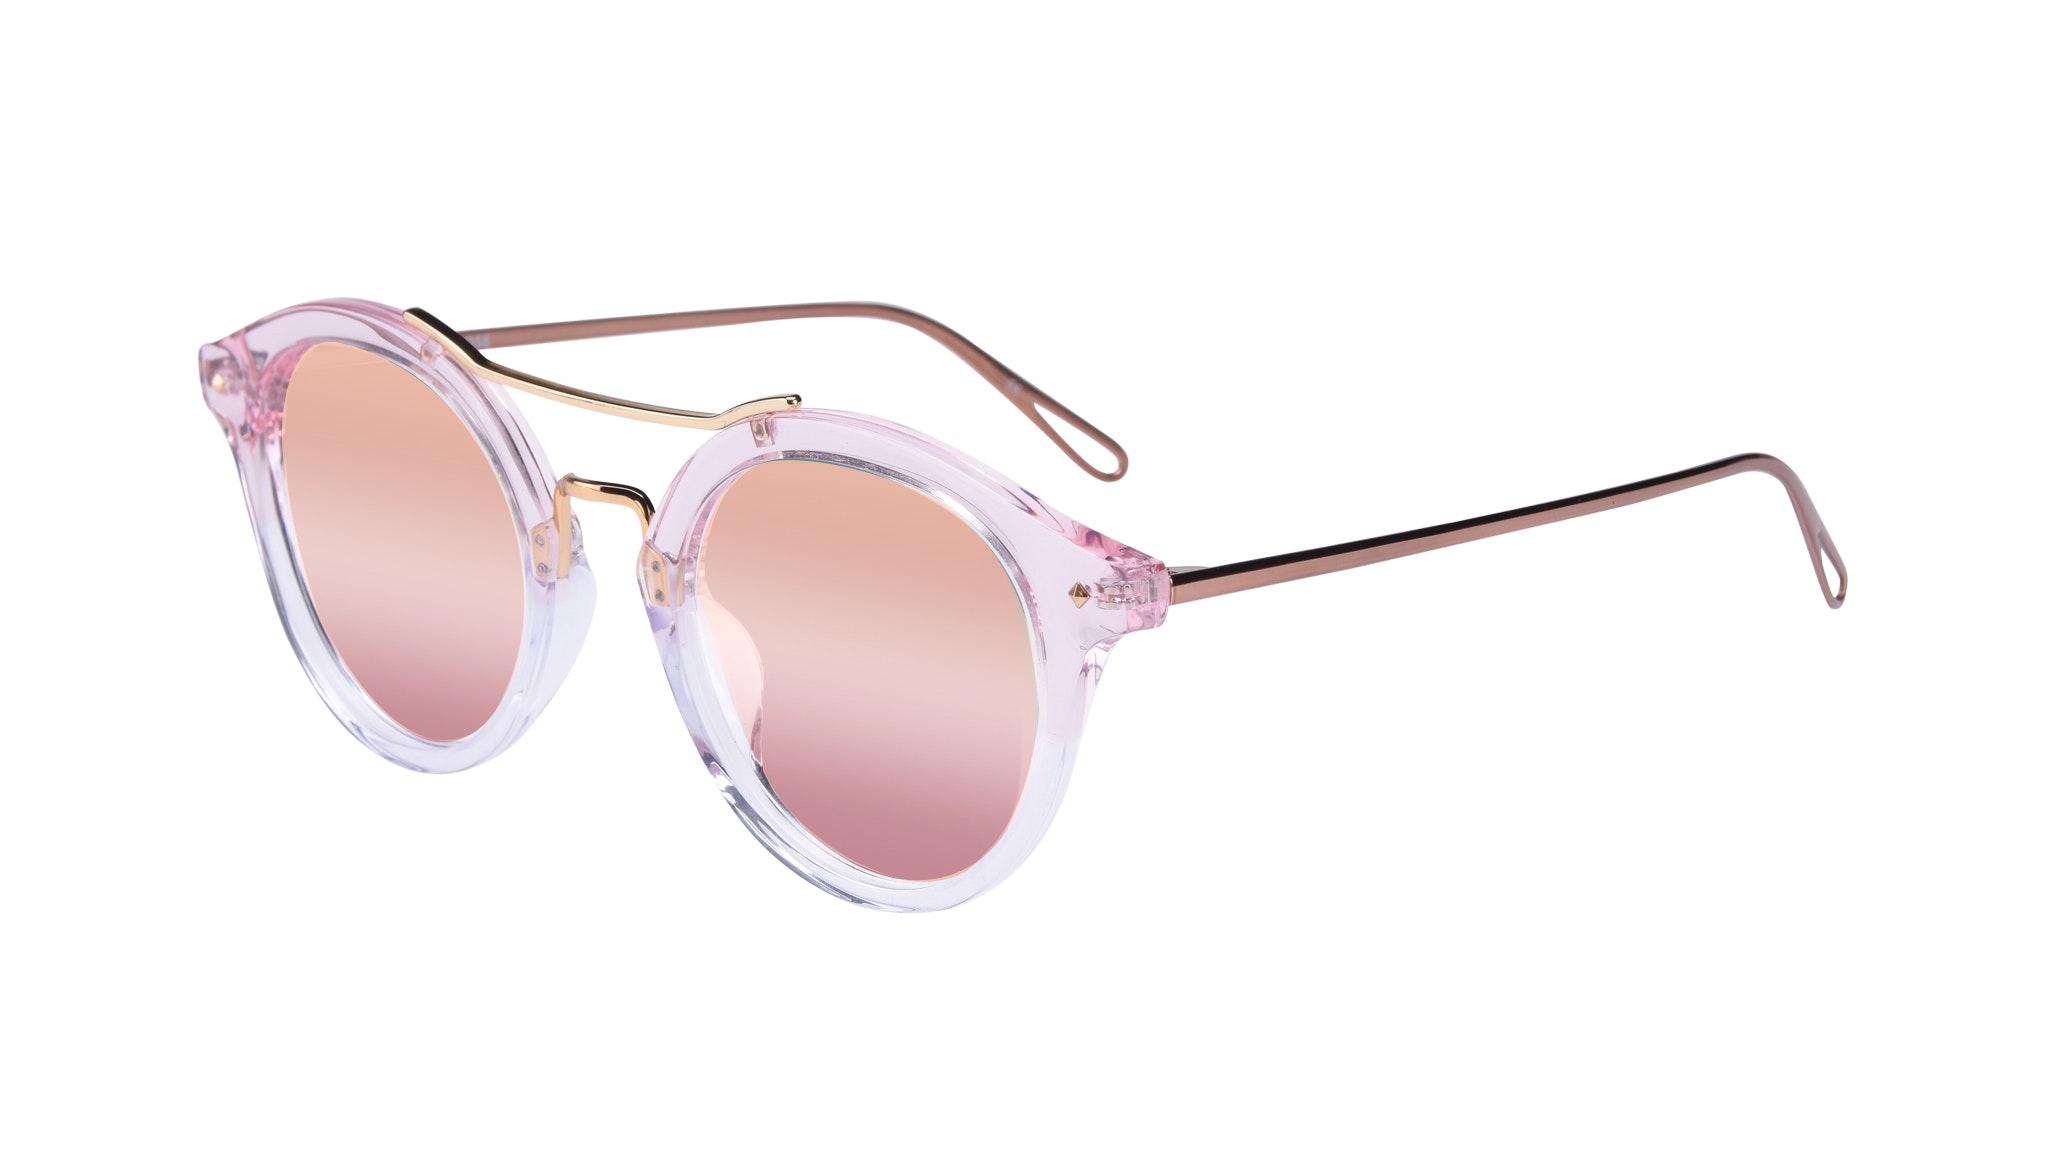 Affordable Fashion Glasses Round Sunglasses Women Infinite Rose Tilt